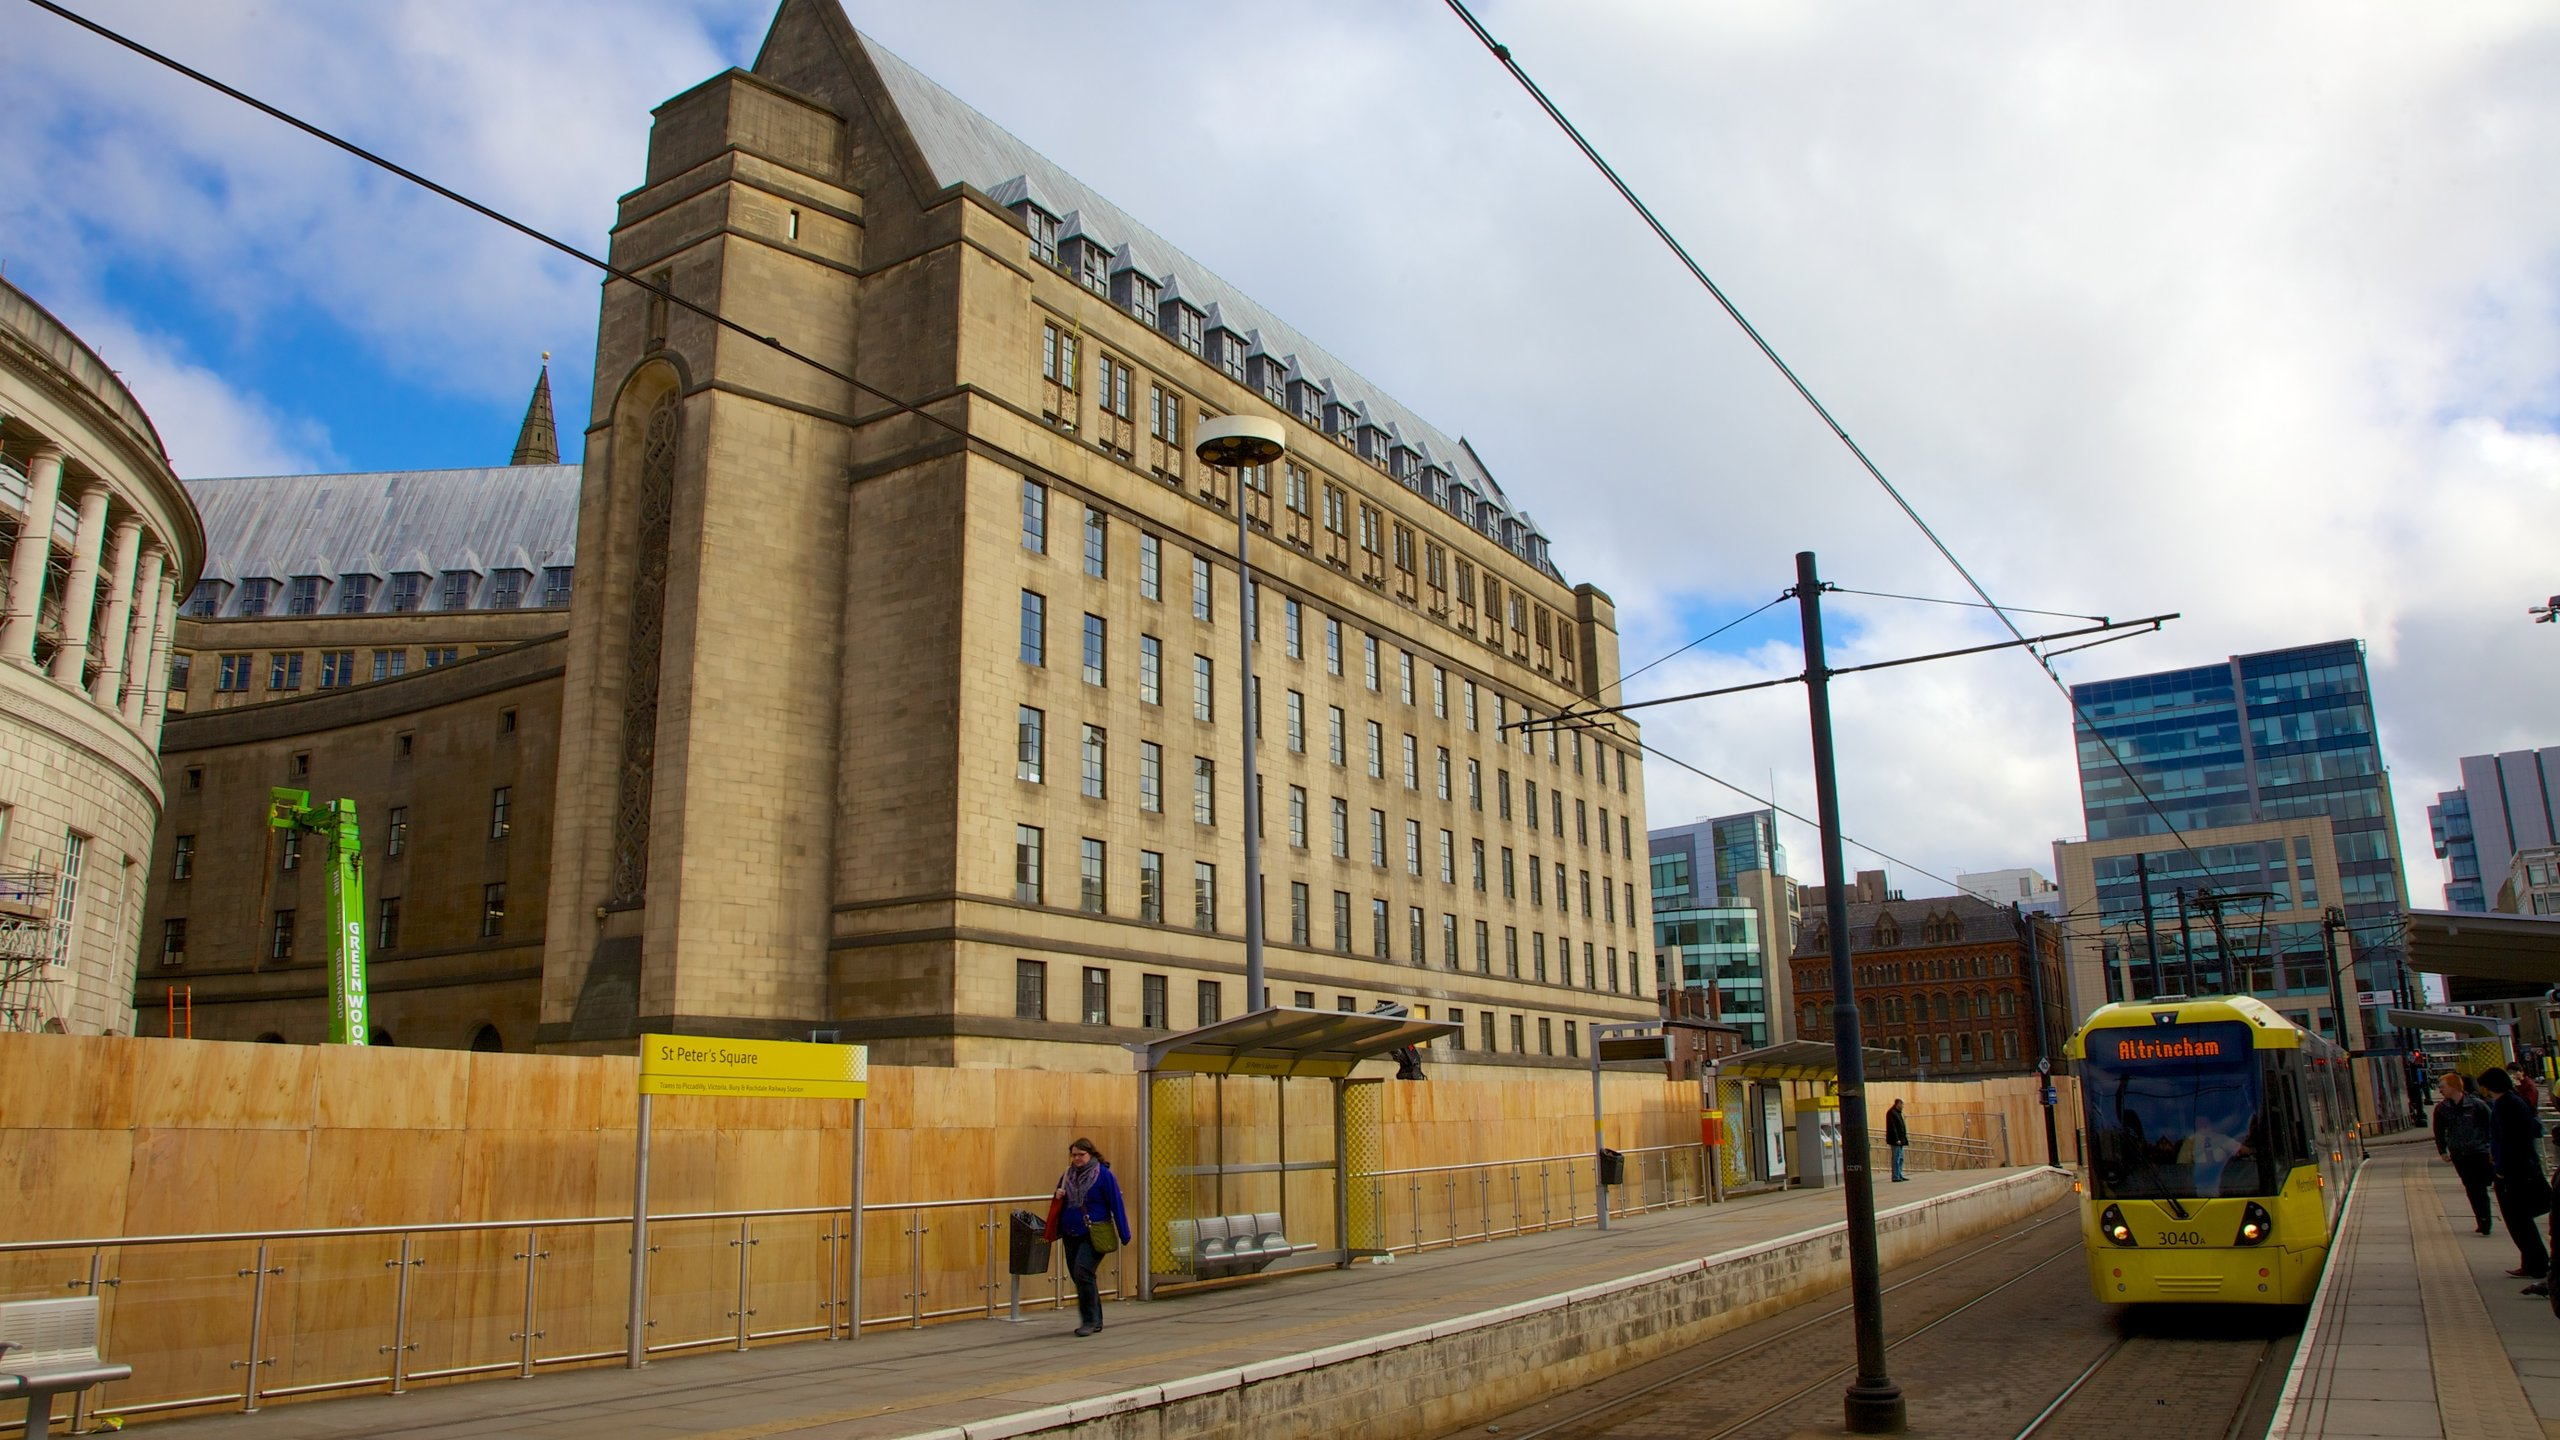 Manchester, England, United Kingdom